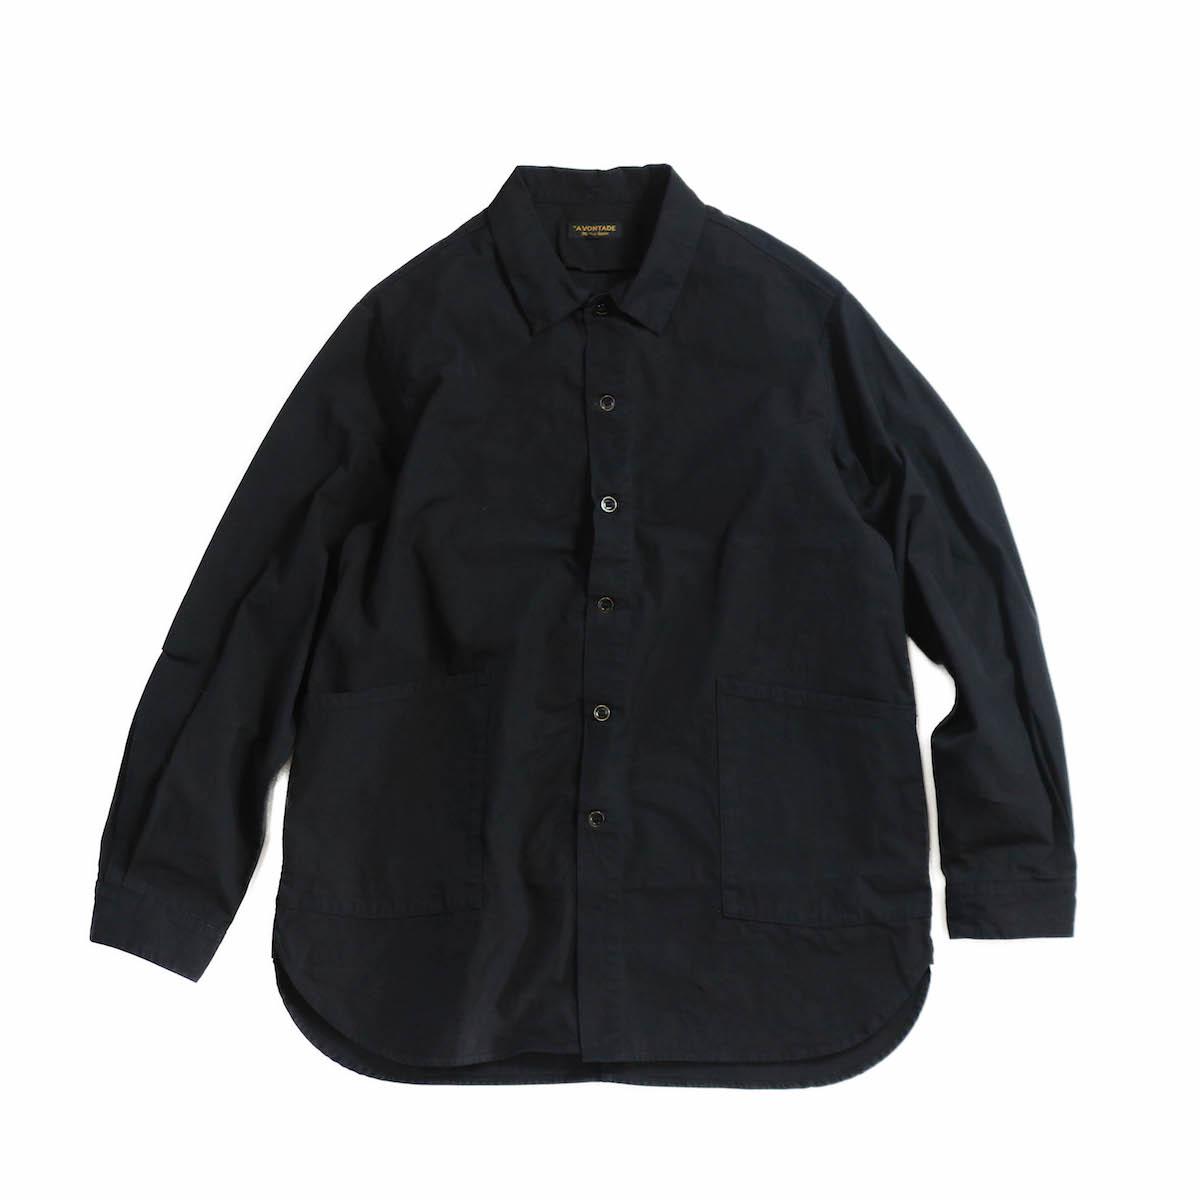 A VONTADE / Gardener Shirt Jacket